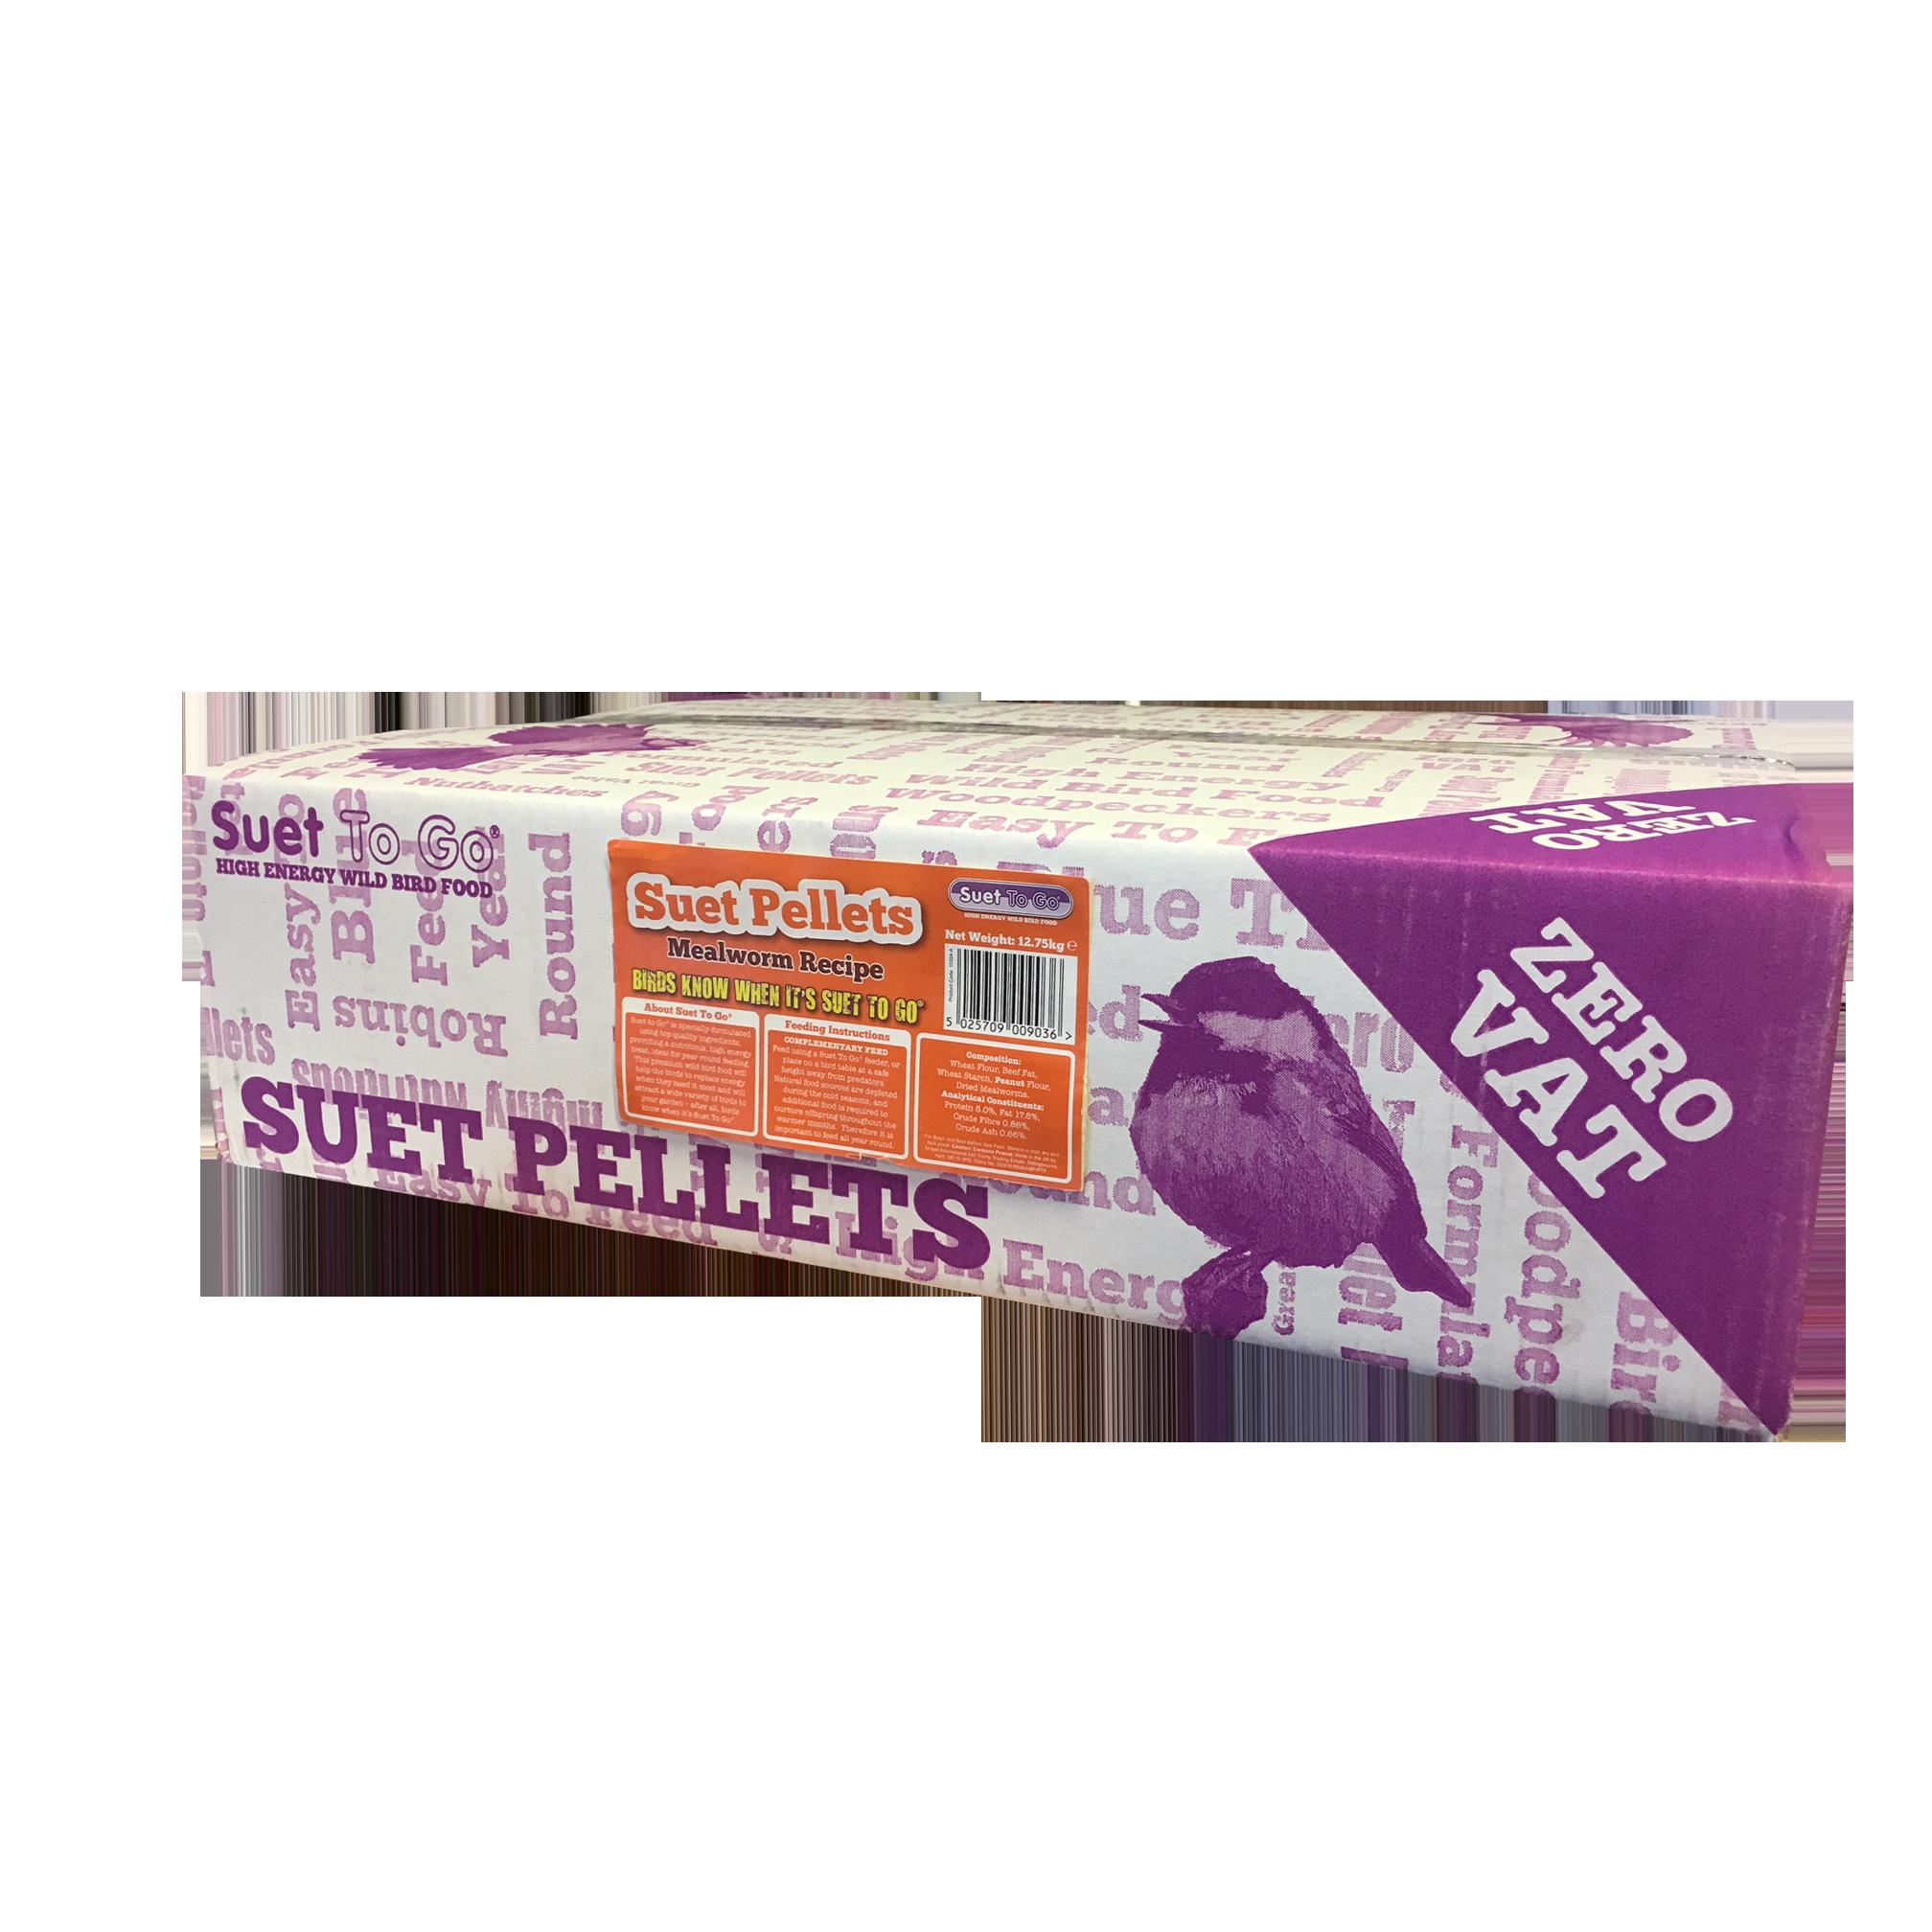 Suet to Go Premium Suet Mealworm Pellets Wild Bird Food 12.75kg